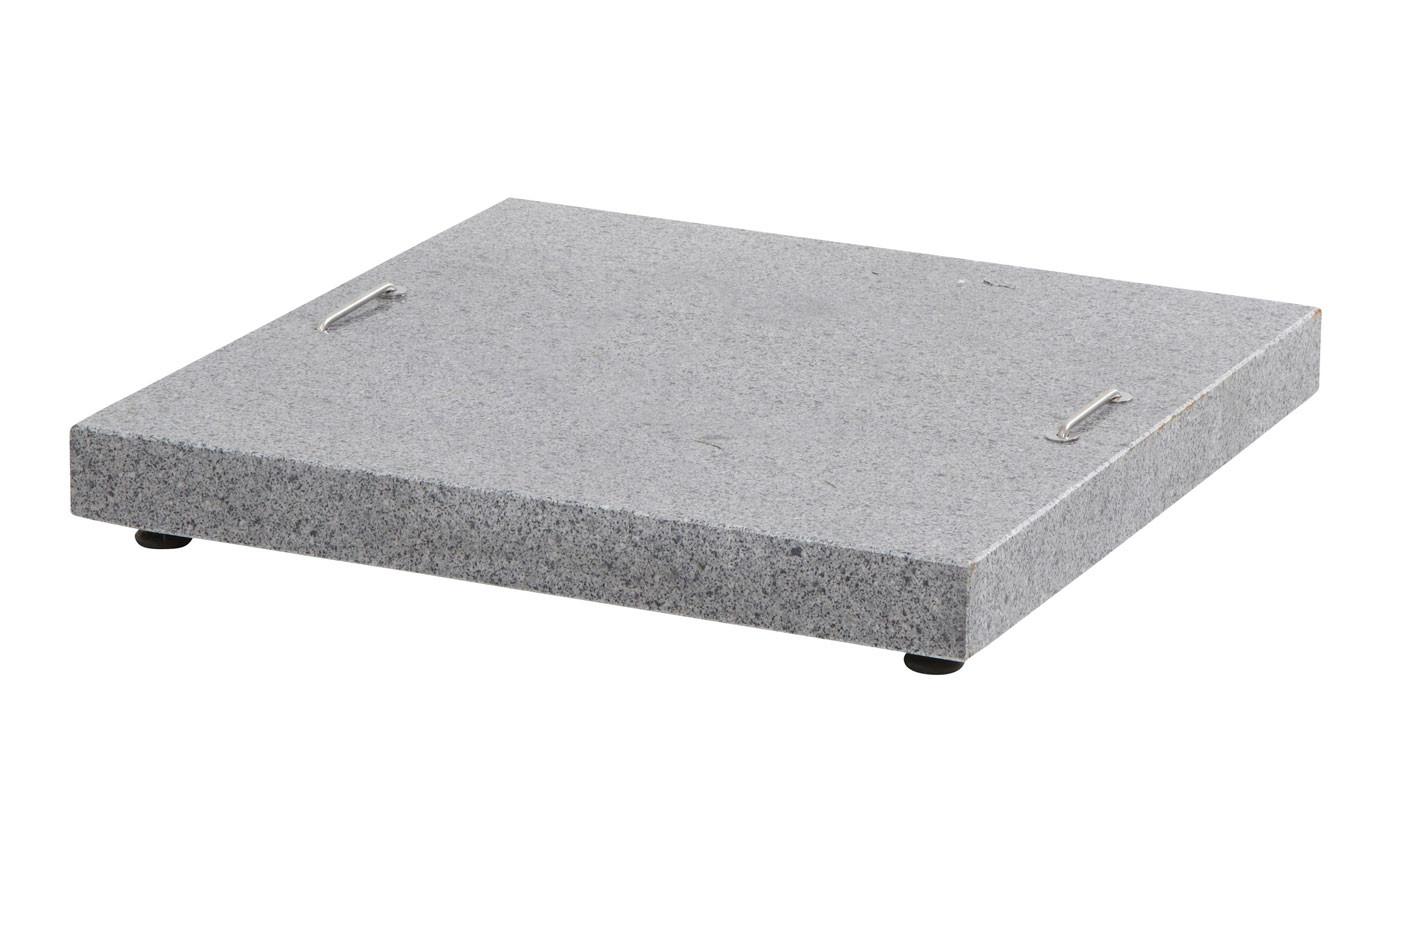 Siesta granite base Anthracite 90 kgs.